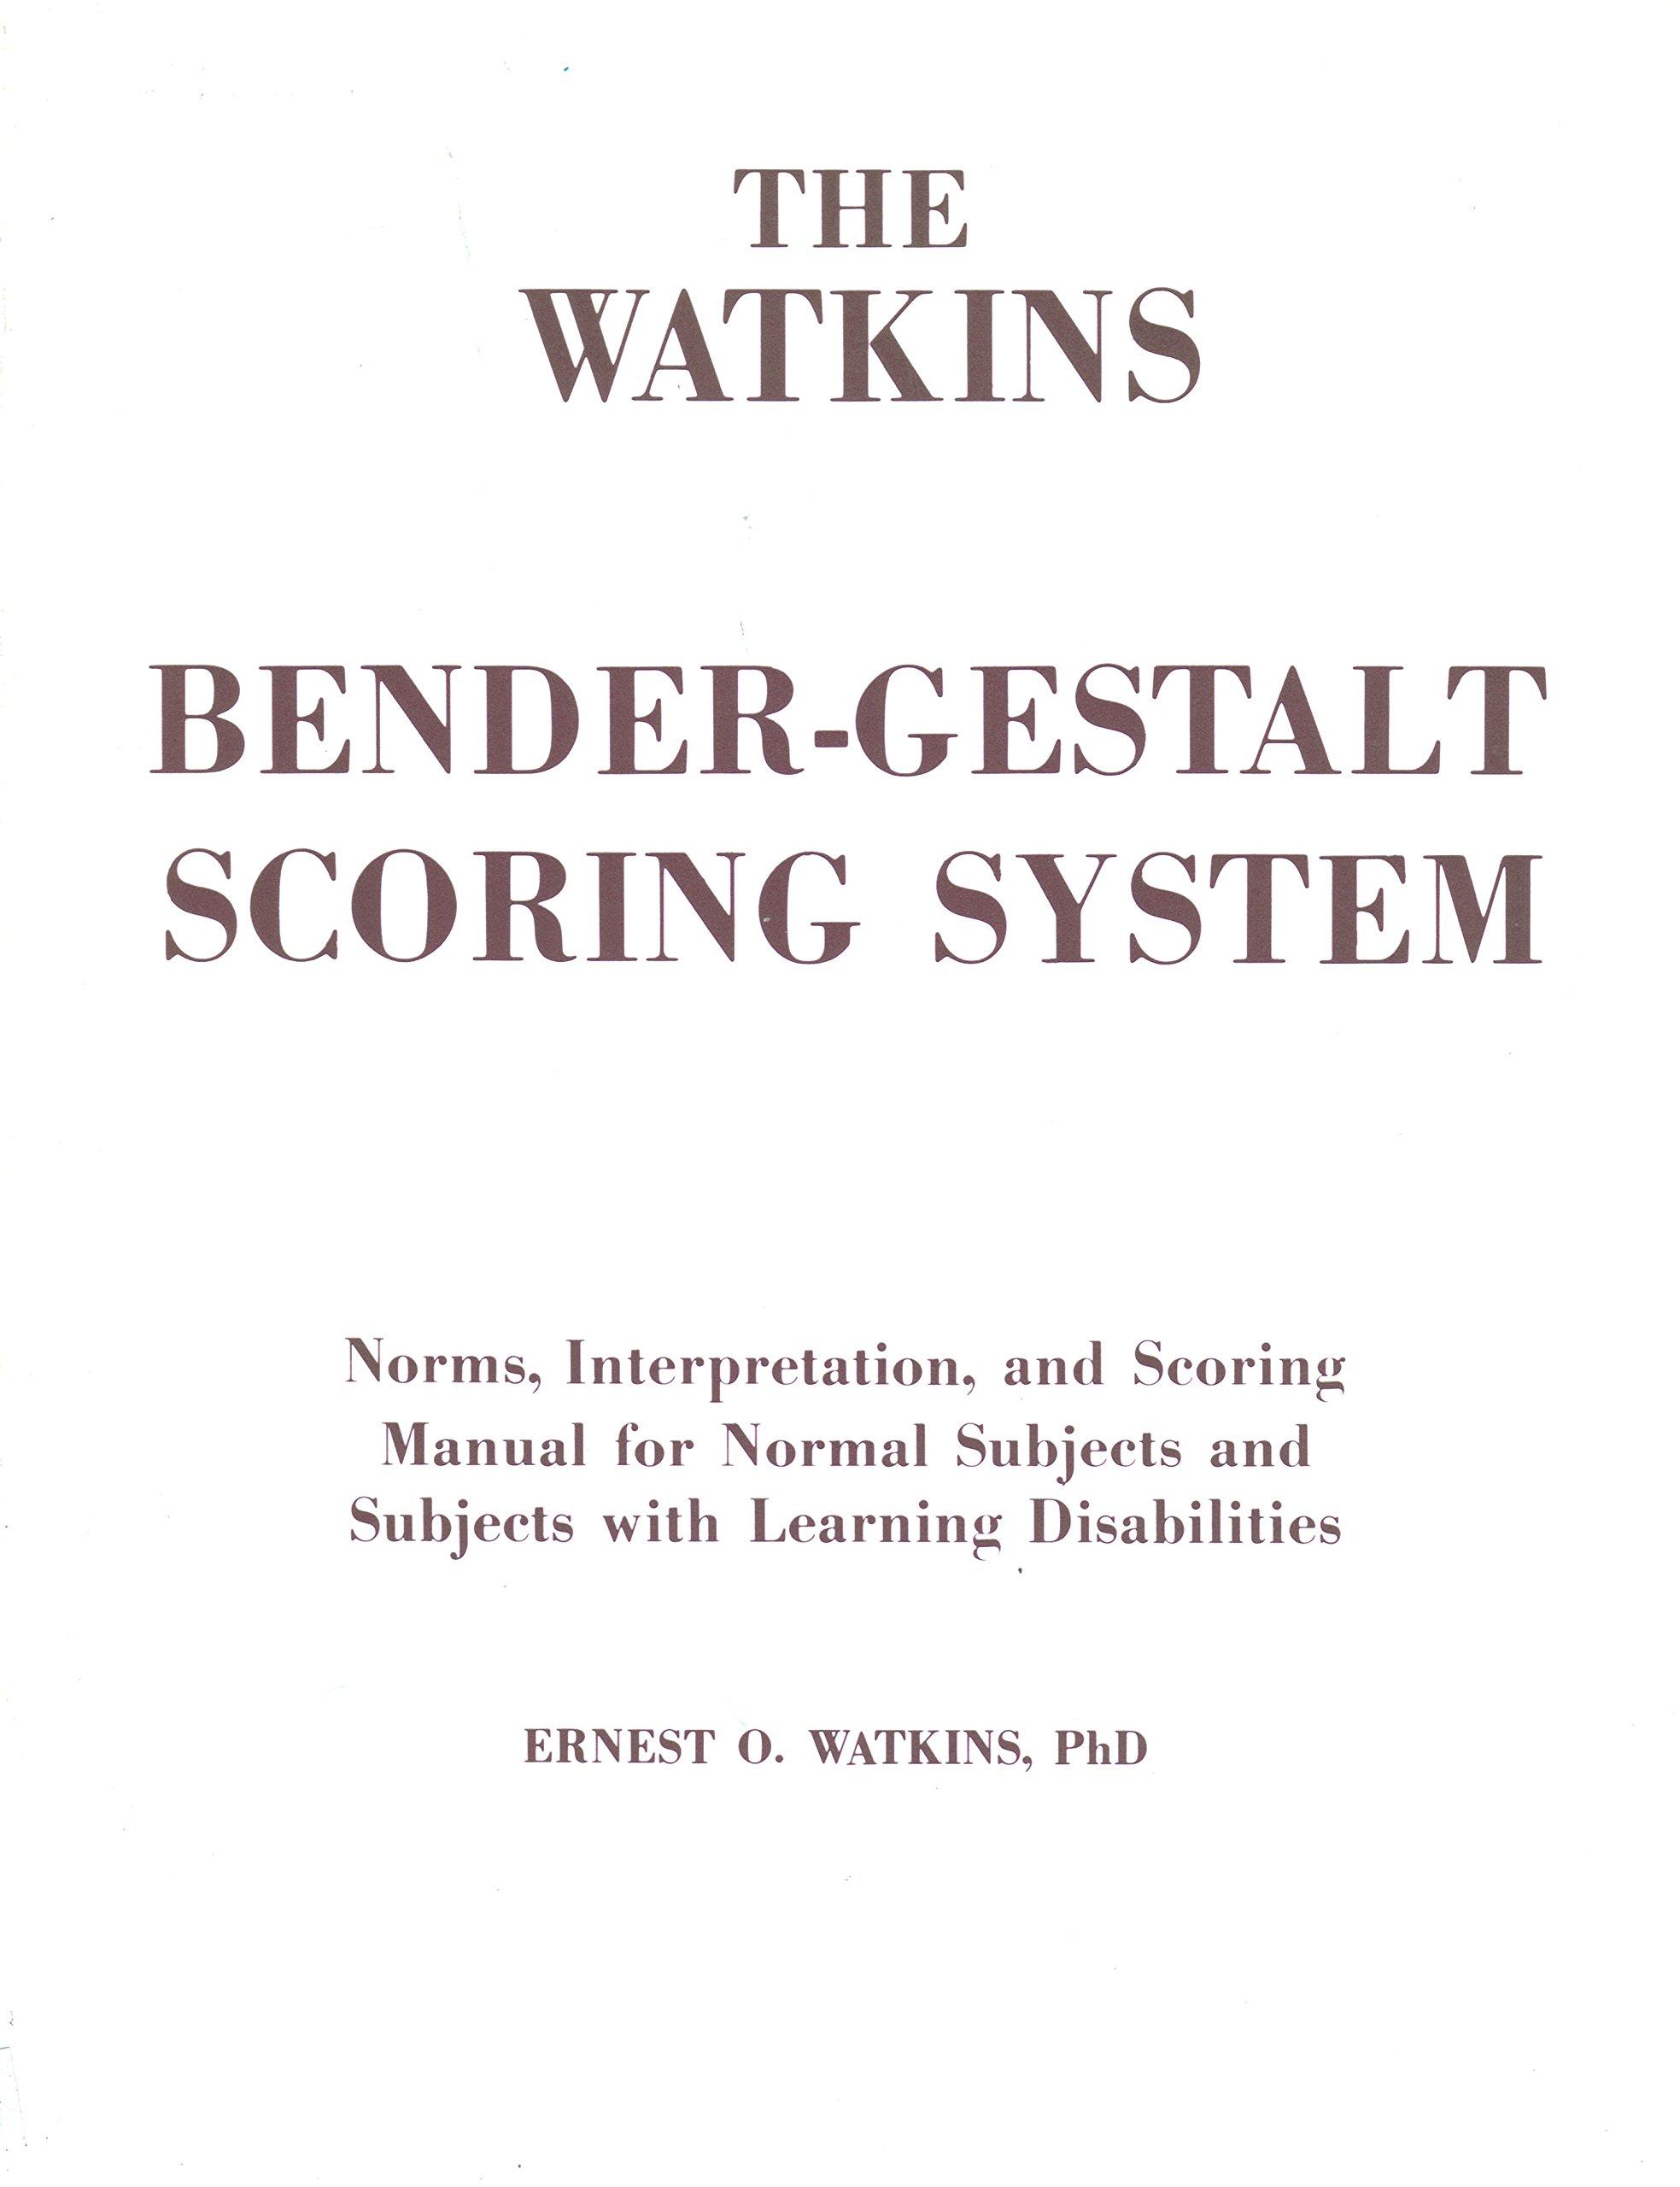 the watkins bender gestalt scoring system norms interpretation rh amazon com From Results Test Sample Benders-Gestalt Bender-Gestalt Drawings